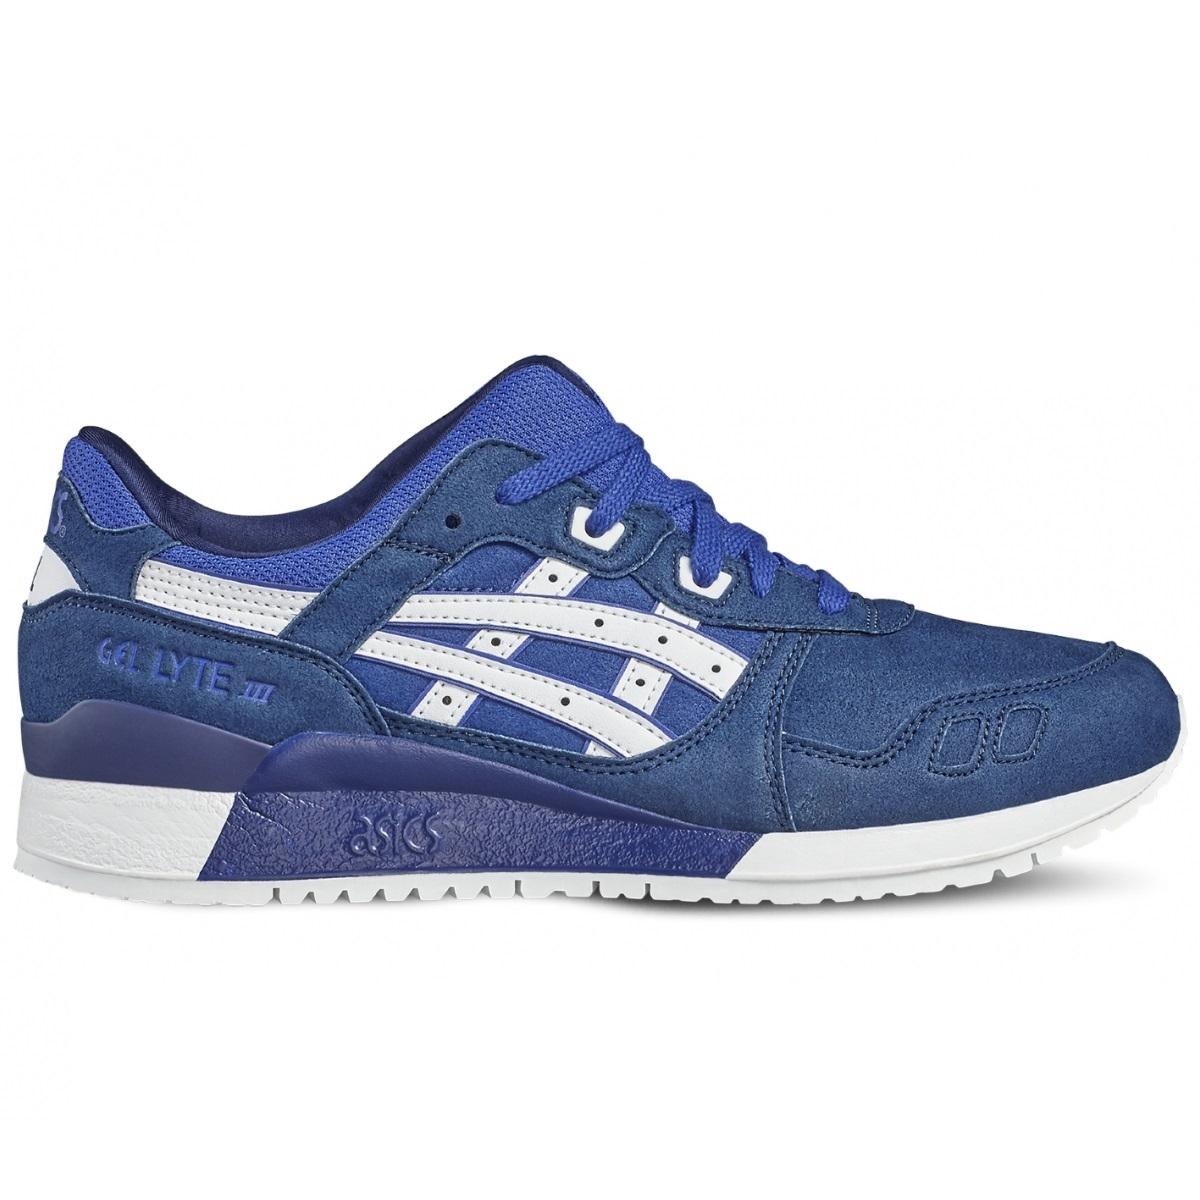 Asics Tiger Gel-Lyte III Sneaker Herren Schuhe blau weiß